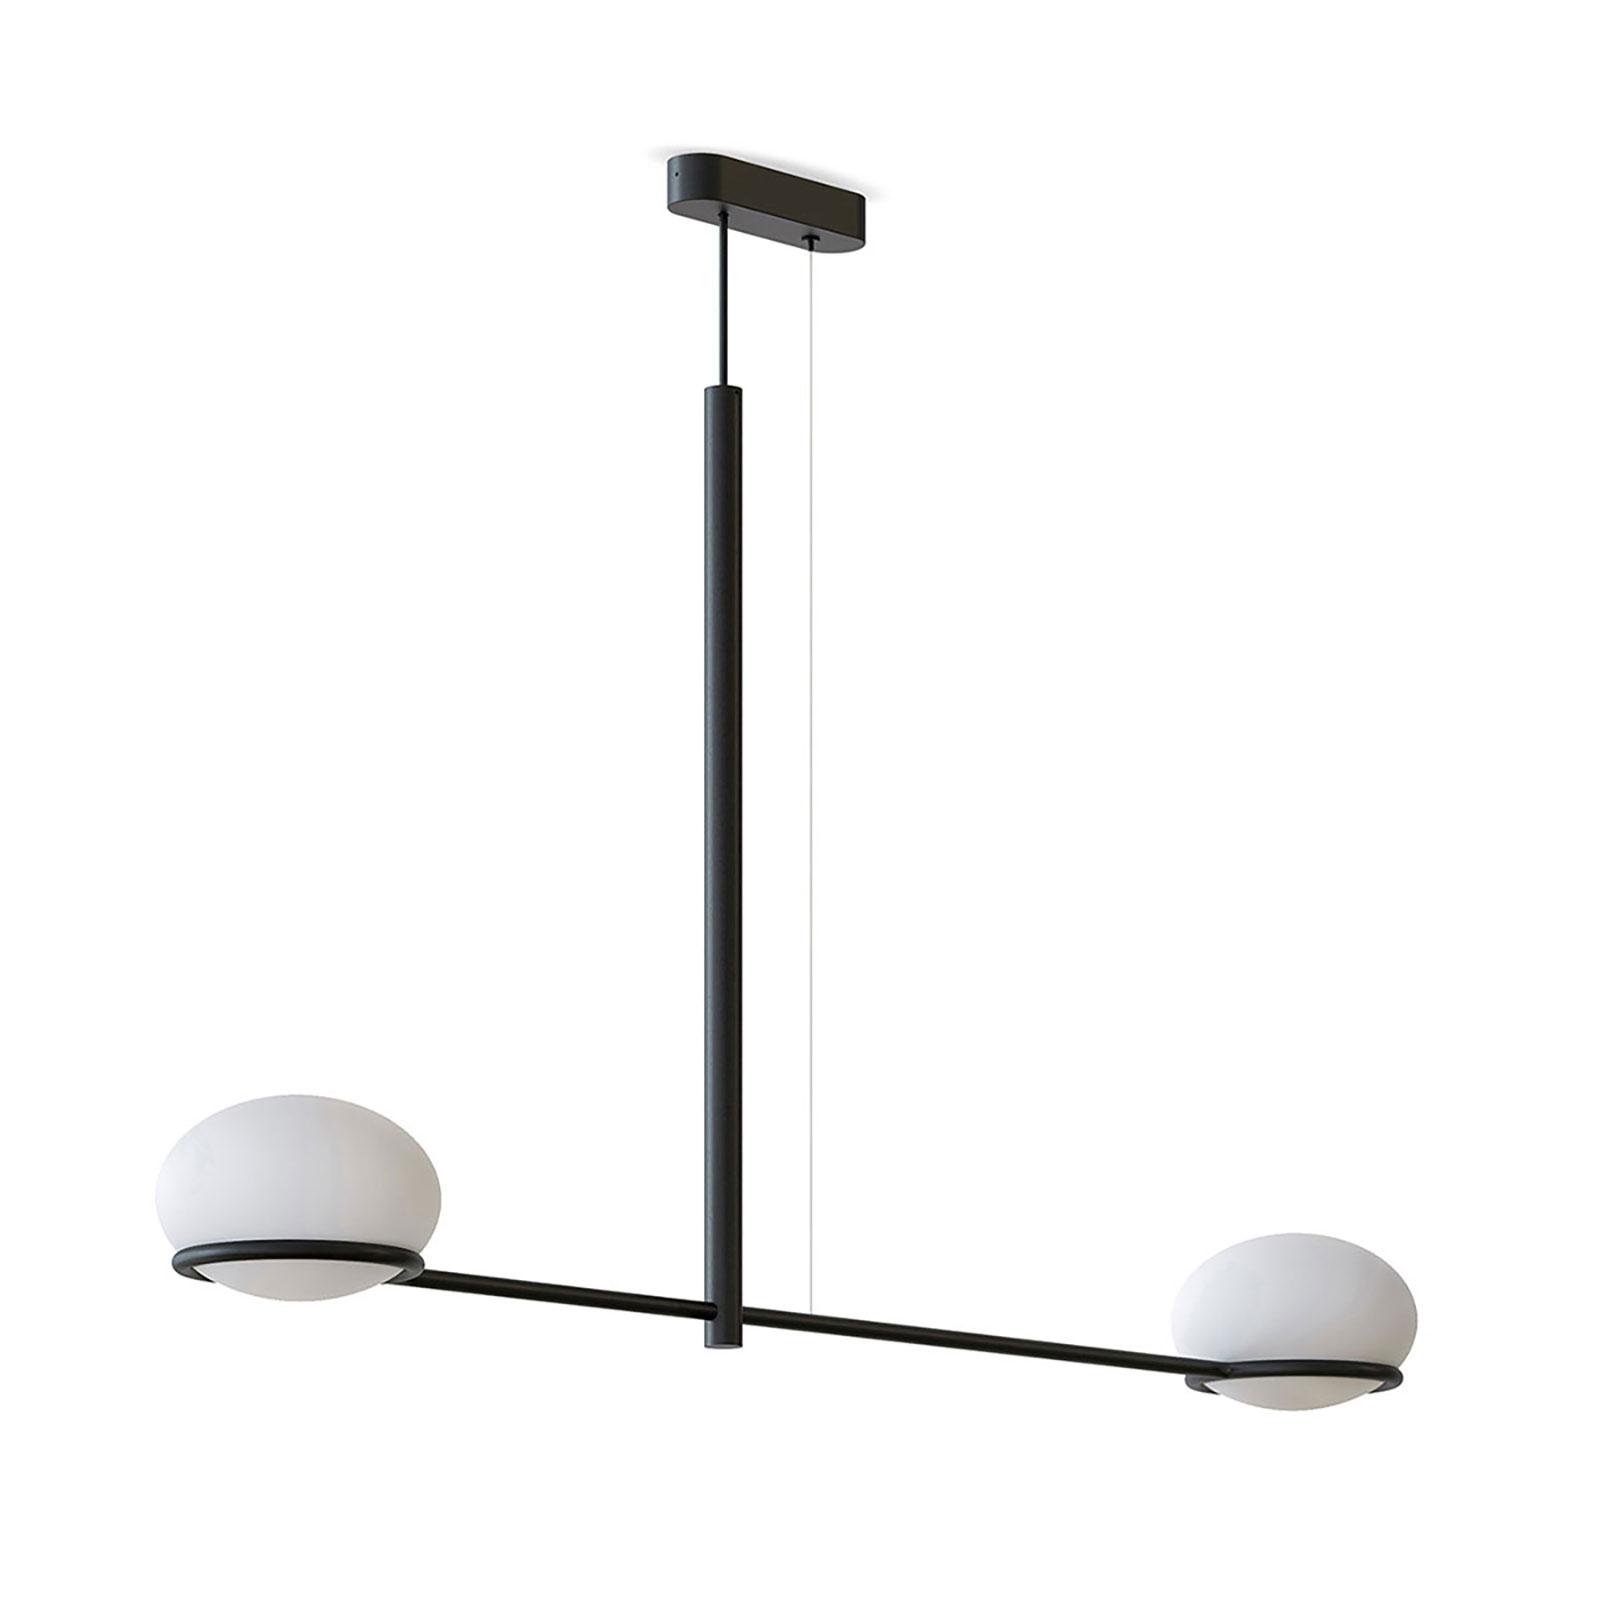 LEDS-C4 Coco Double -riippuvalo musta/valkoinen